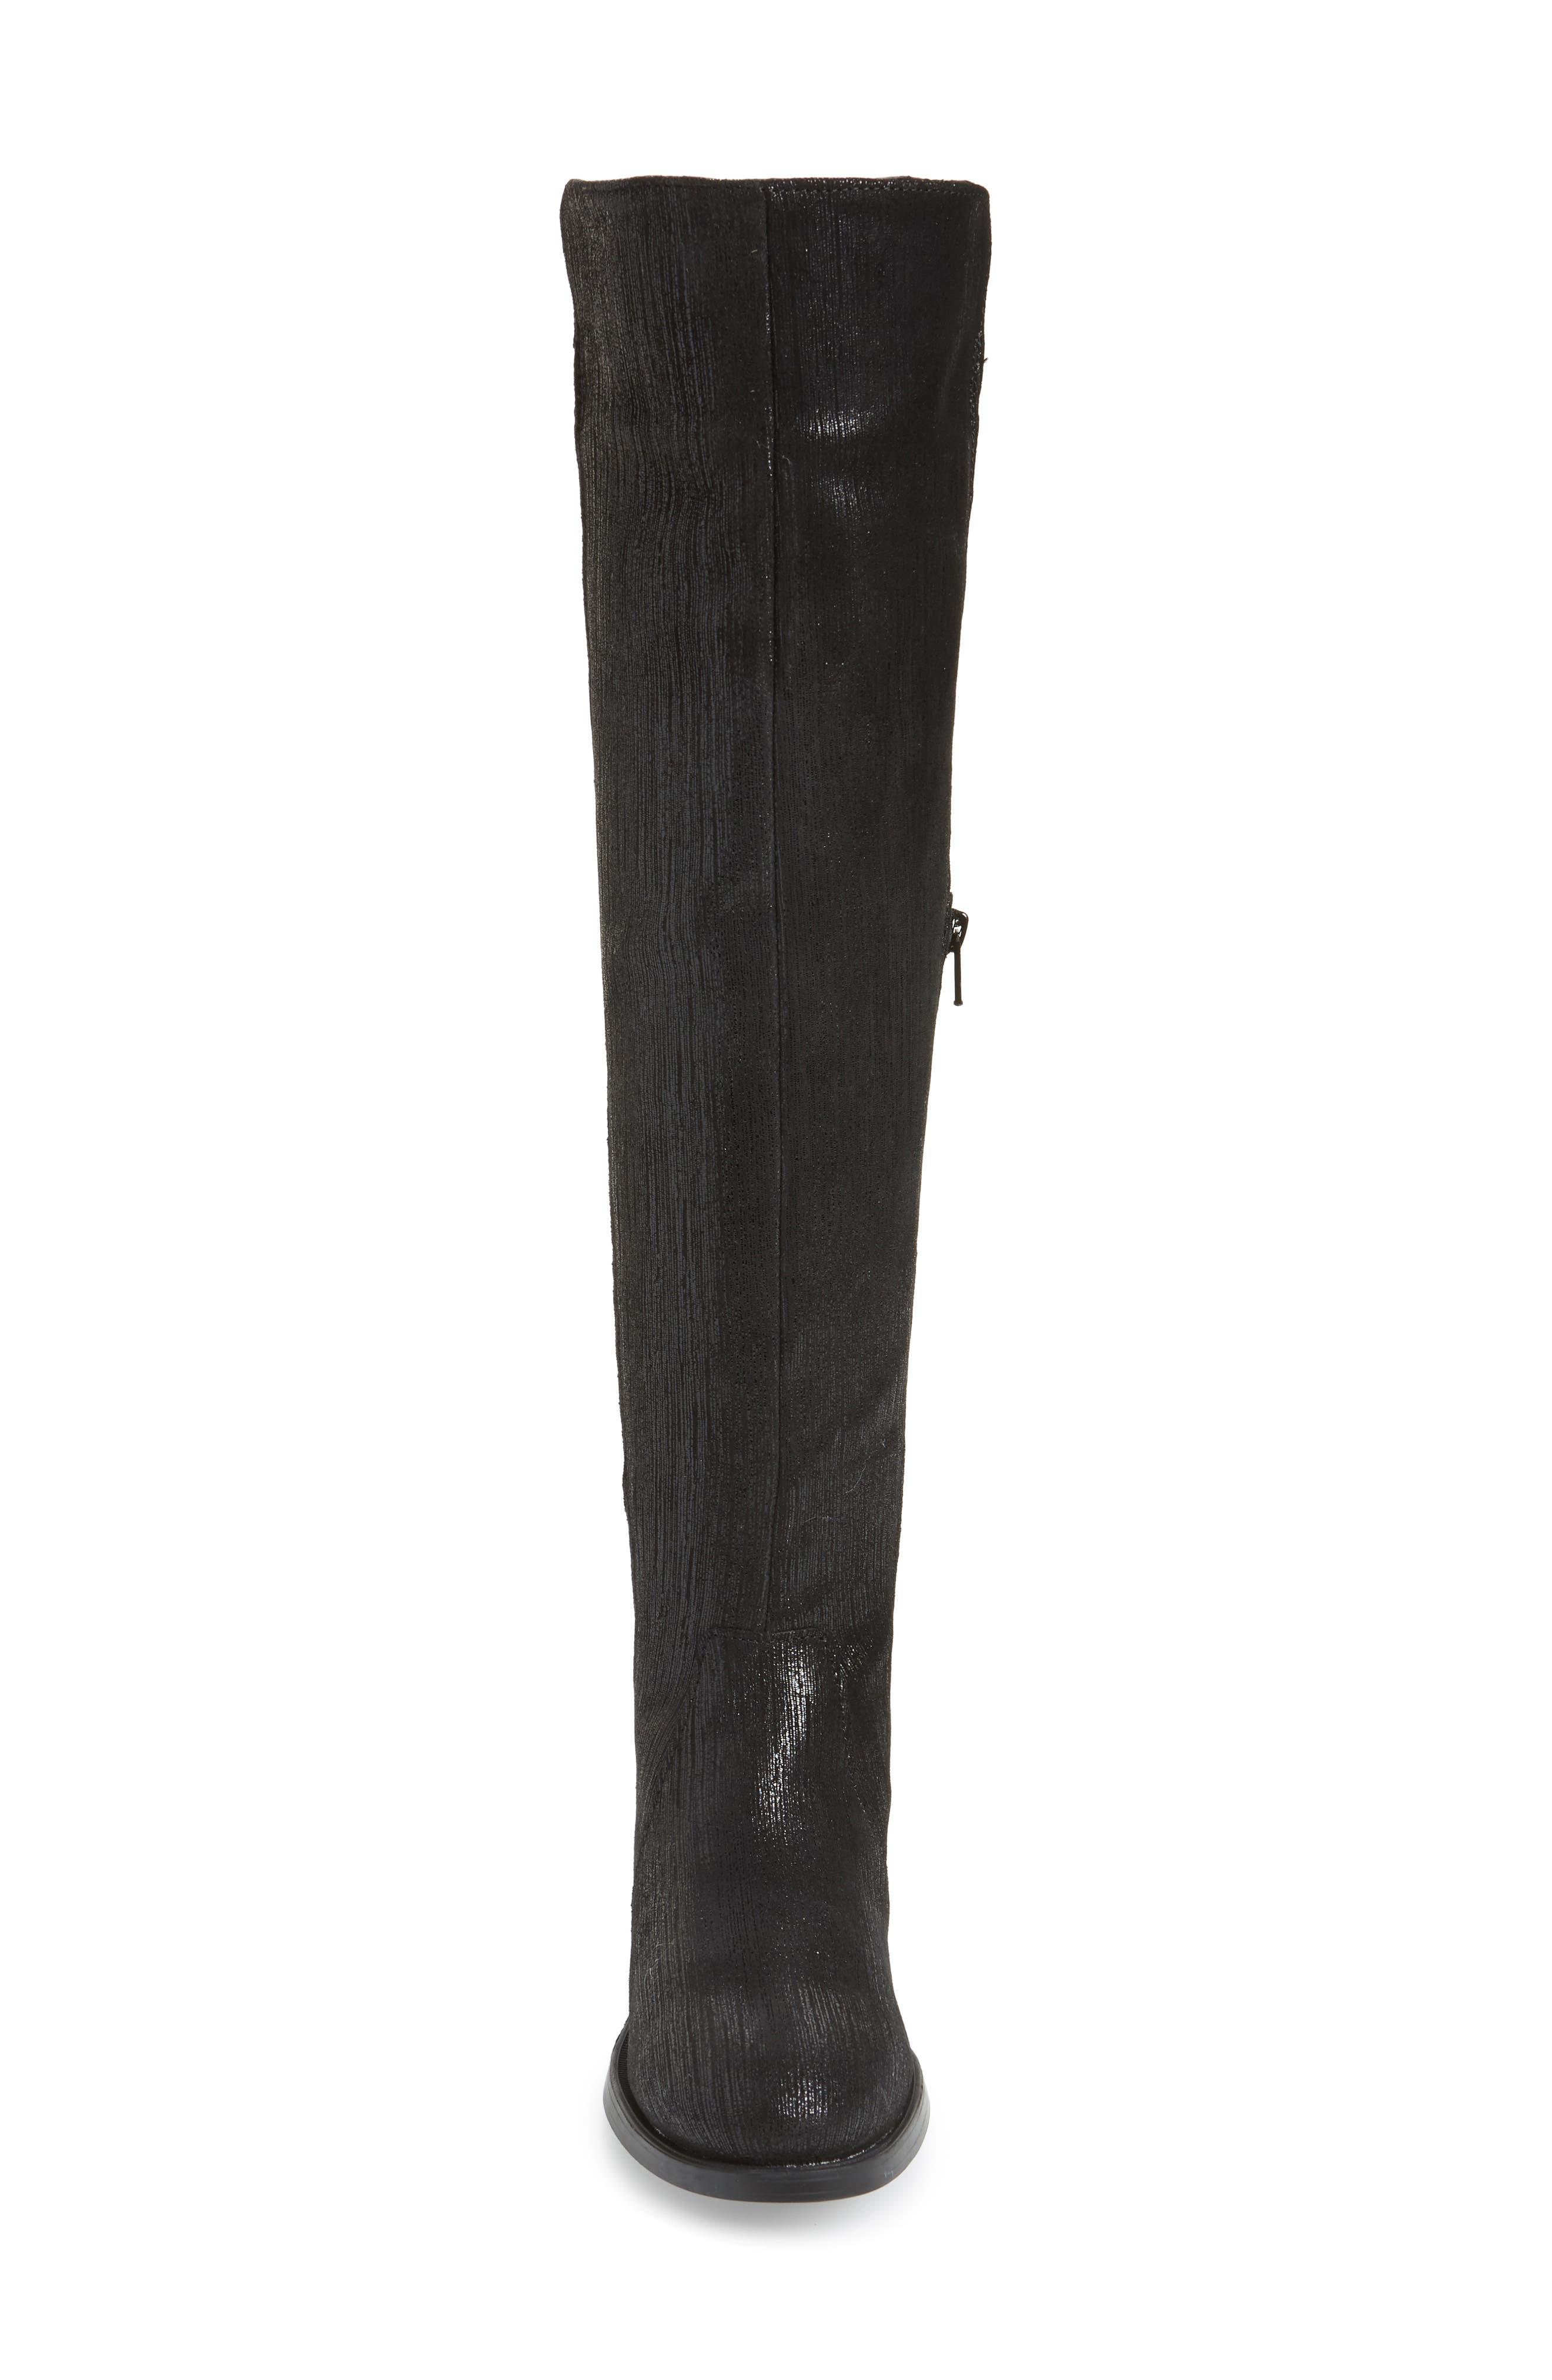 BOS. & CO., Bunt Waterproof Over the Knee Boot, Alternate thumbnail 4, color, BLACK METAL/ LYCRA